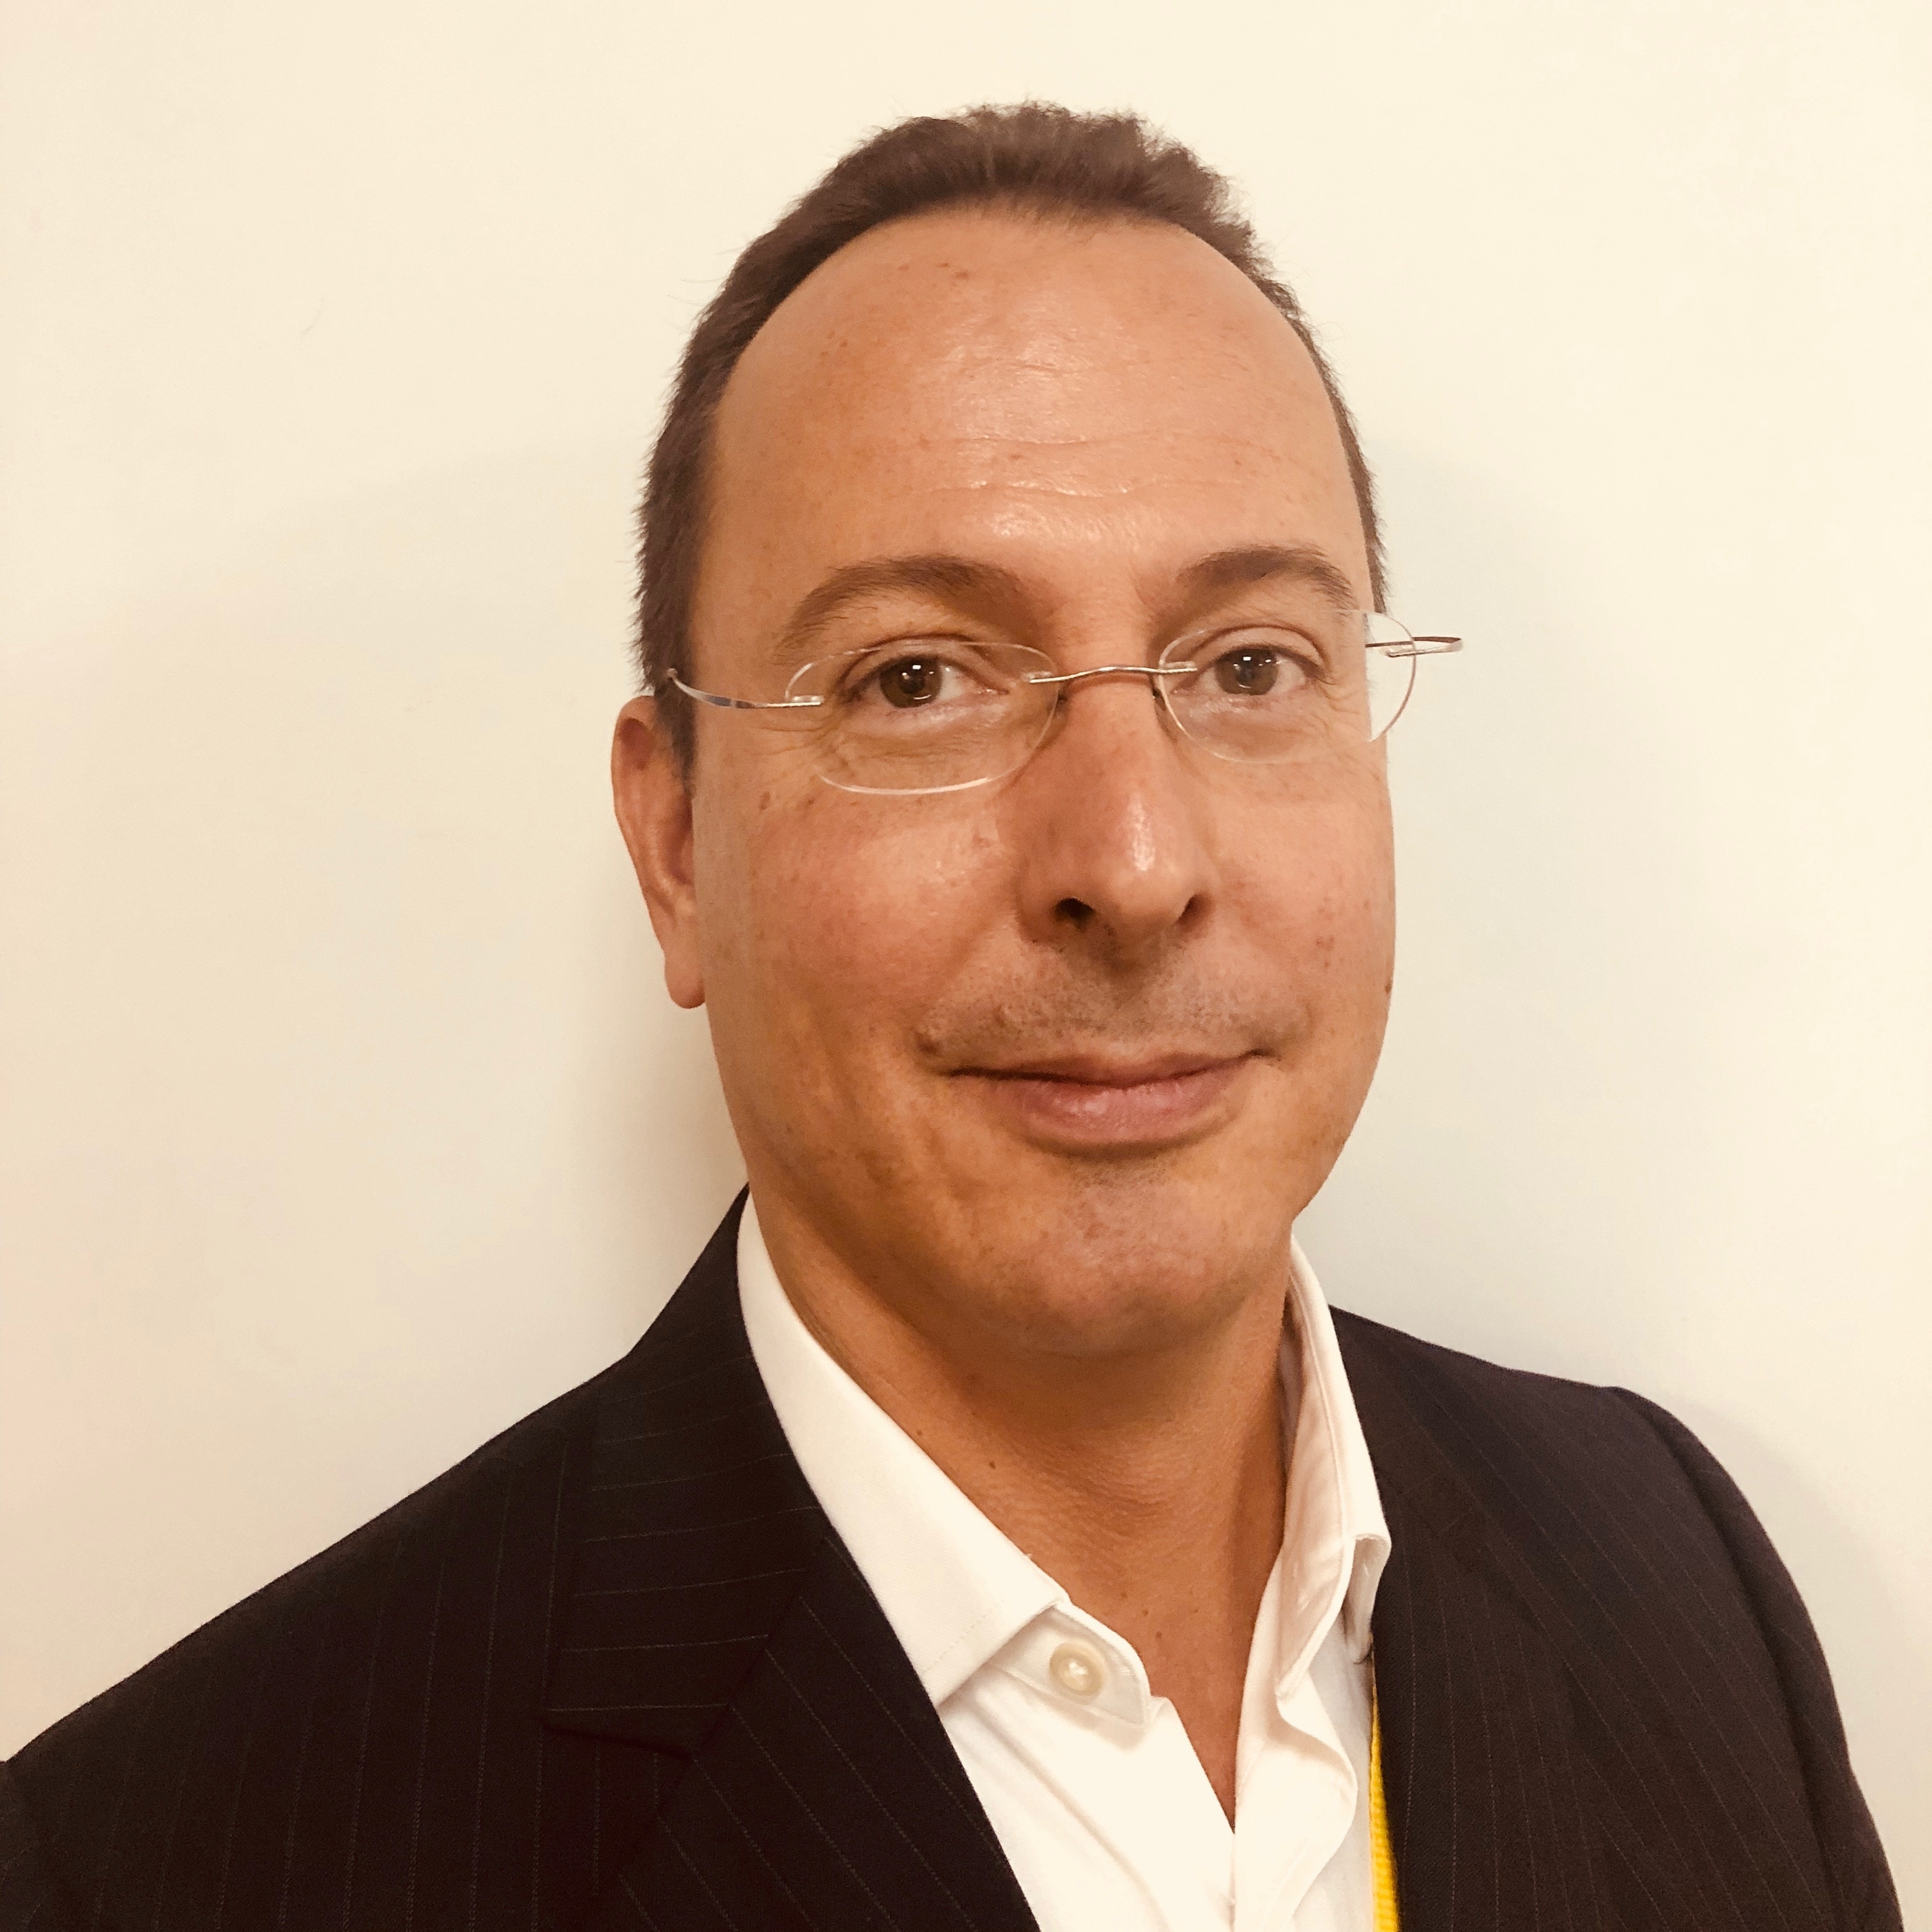 Welcome de Villele | Executive Vice President